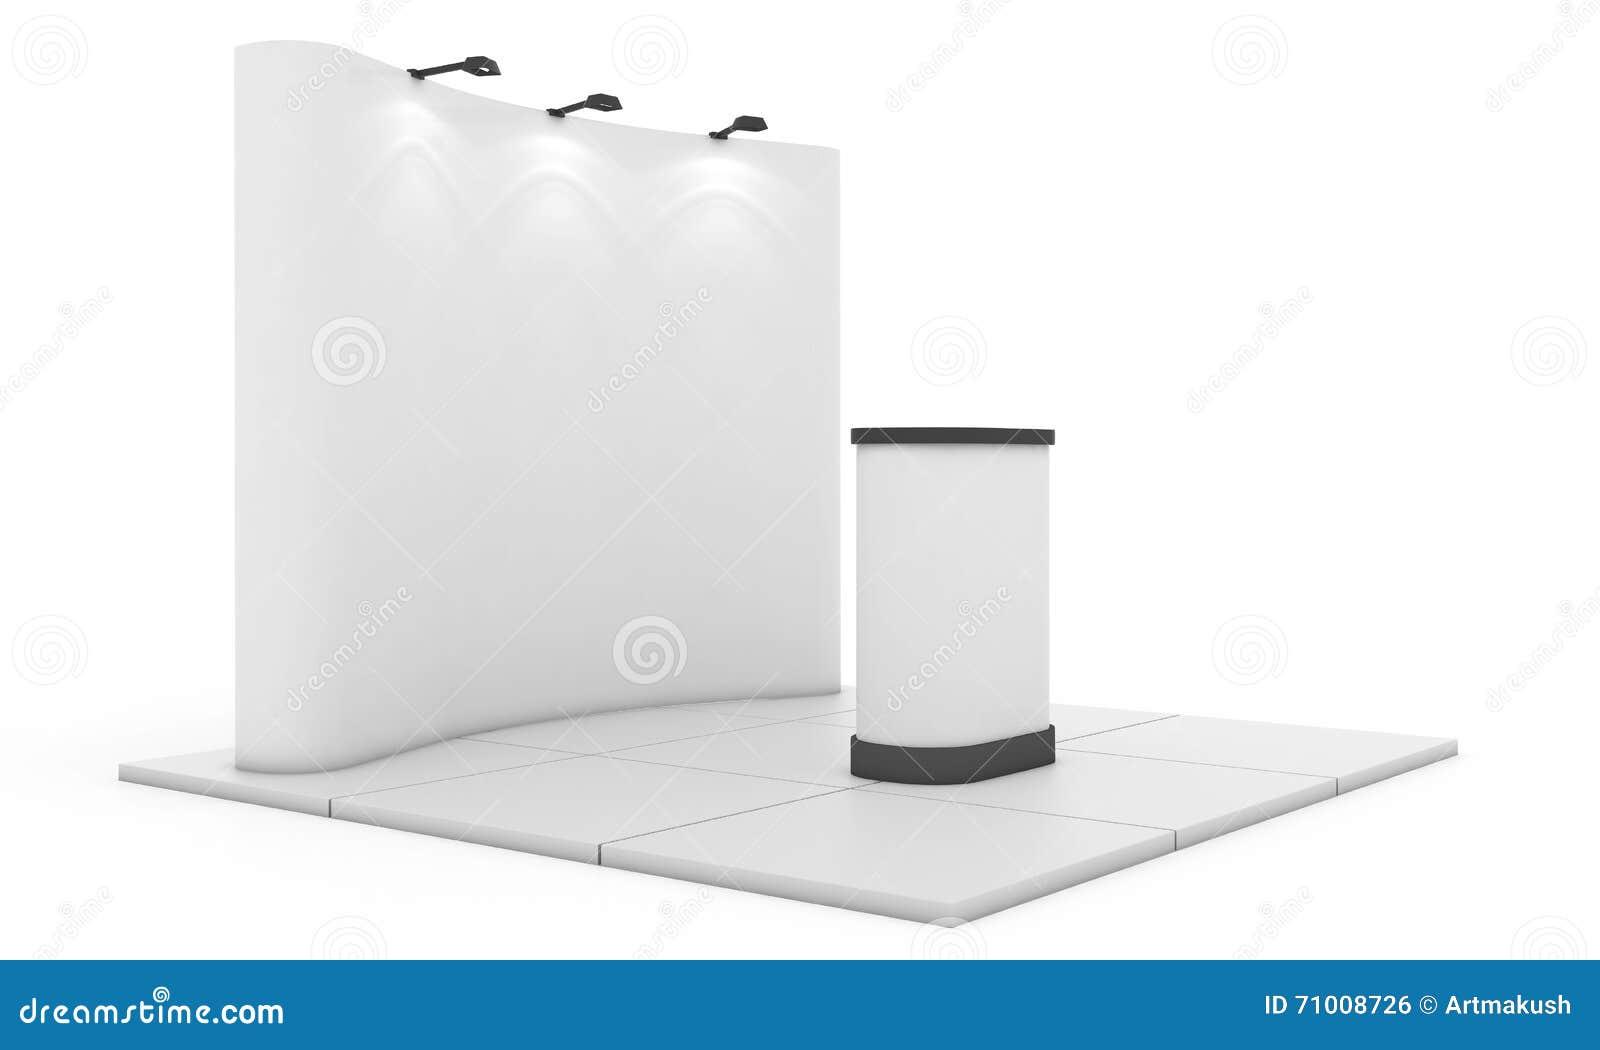 Exhibition Stand Design Illustrator : Trade exhibition stand round d